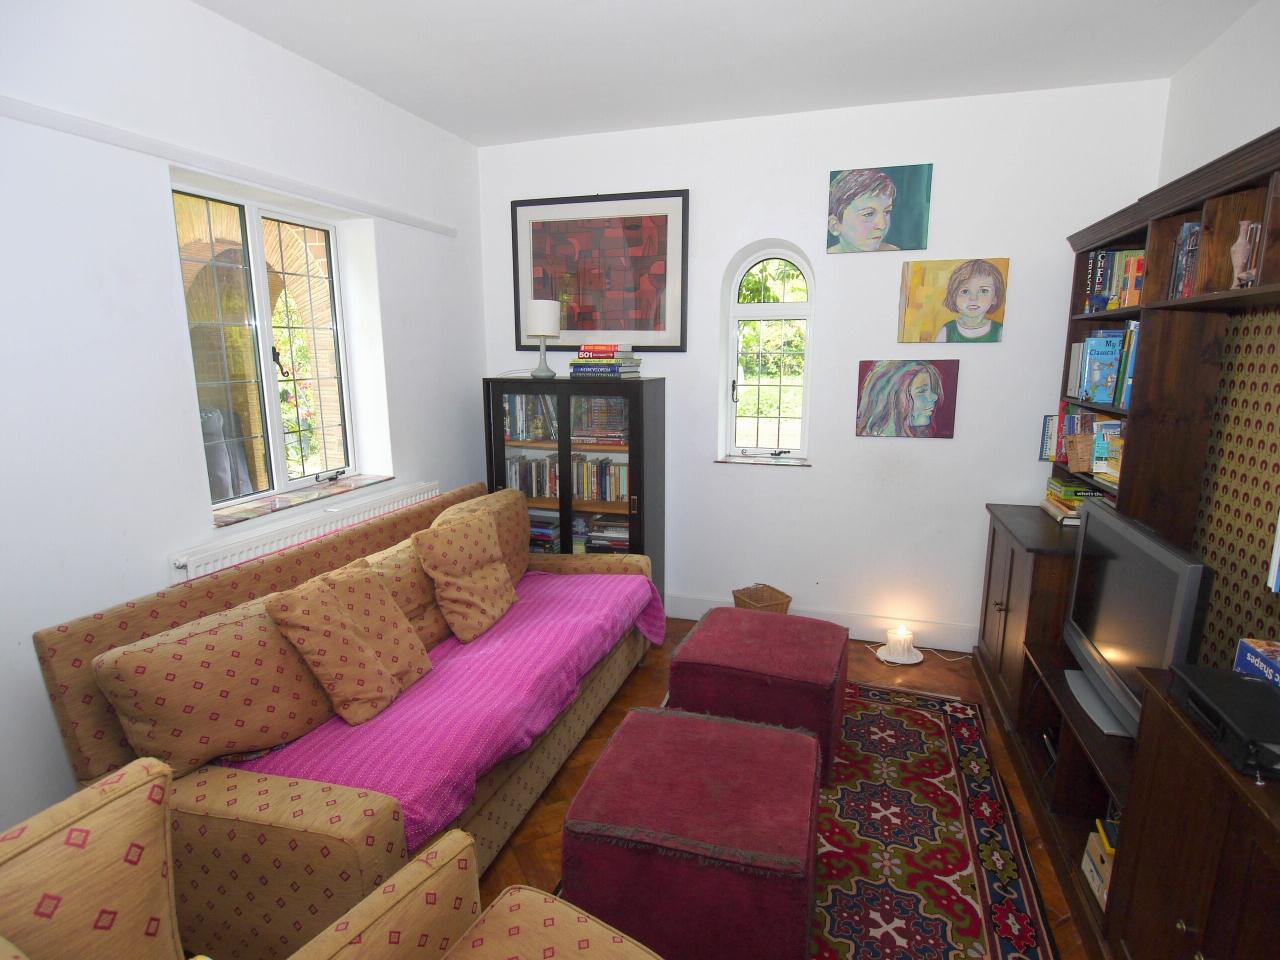 6 bedroom detached house Sold in Sevenoaks - Photograph 3